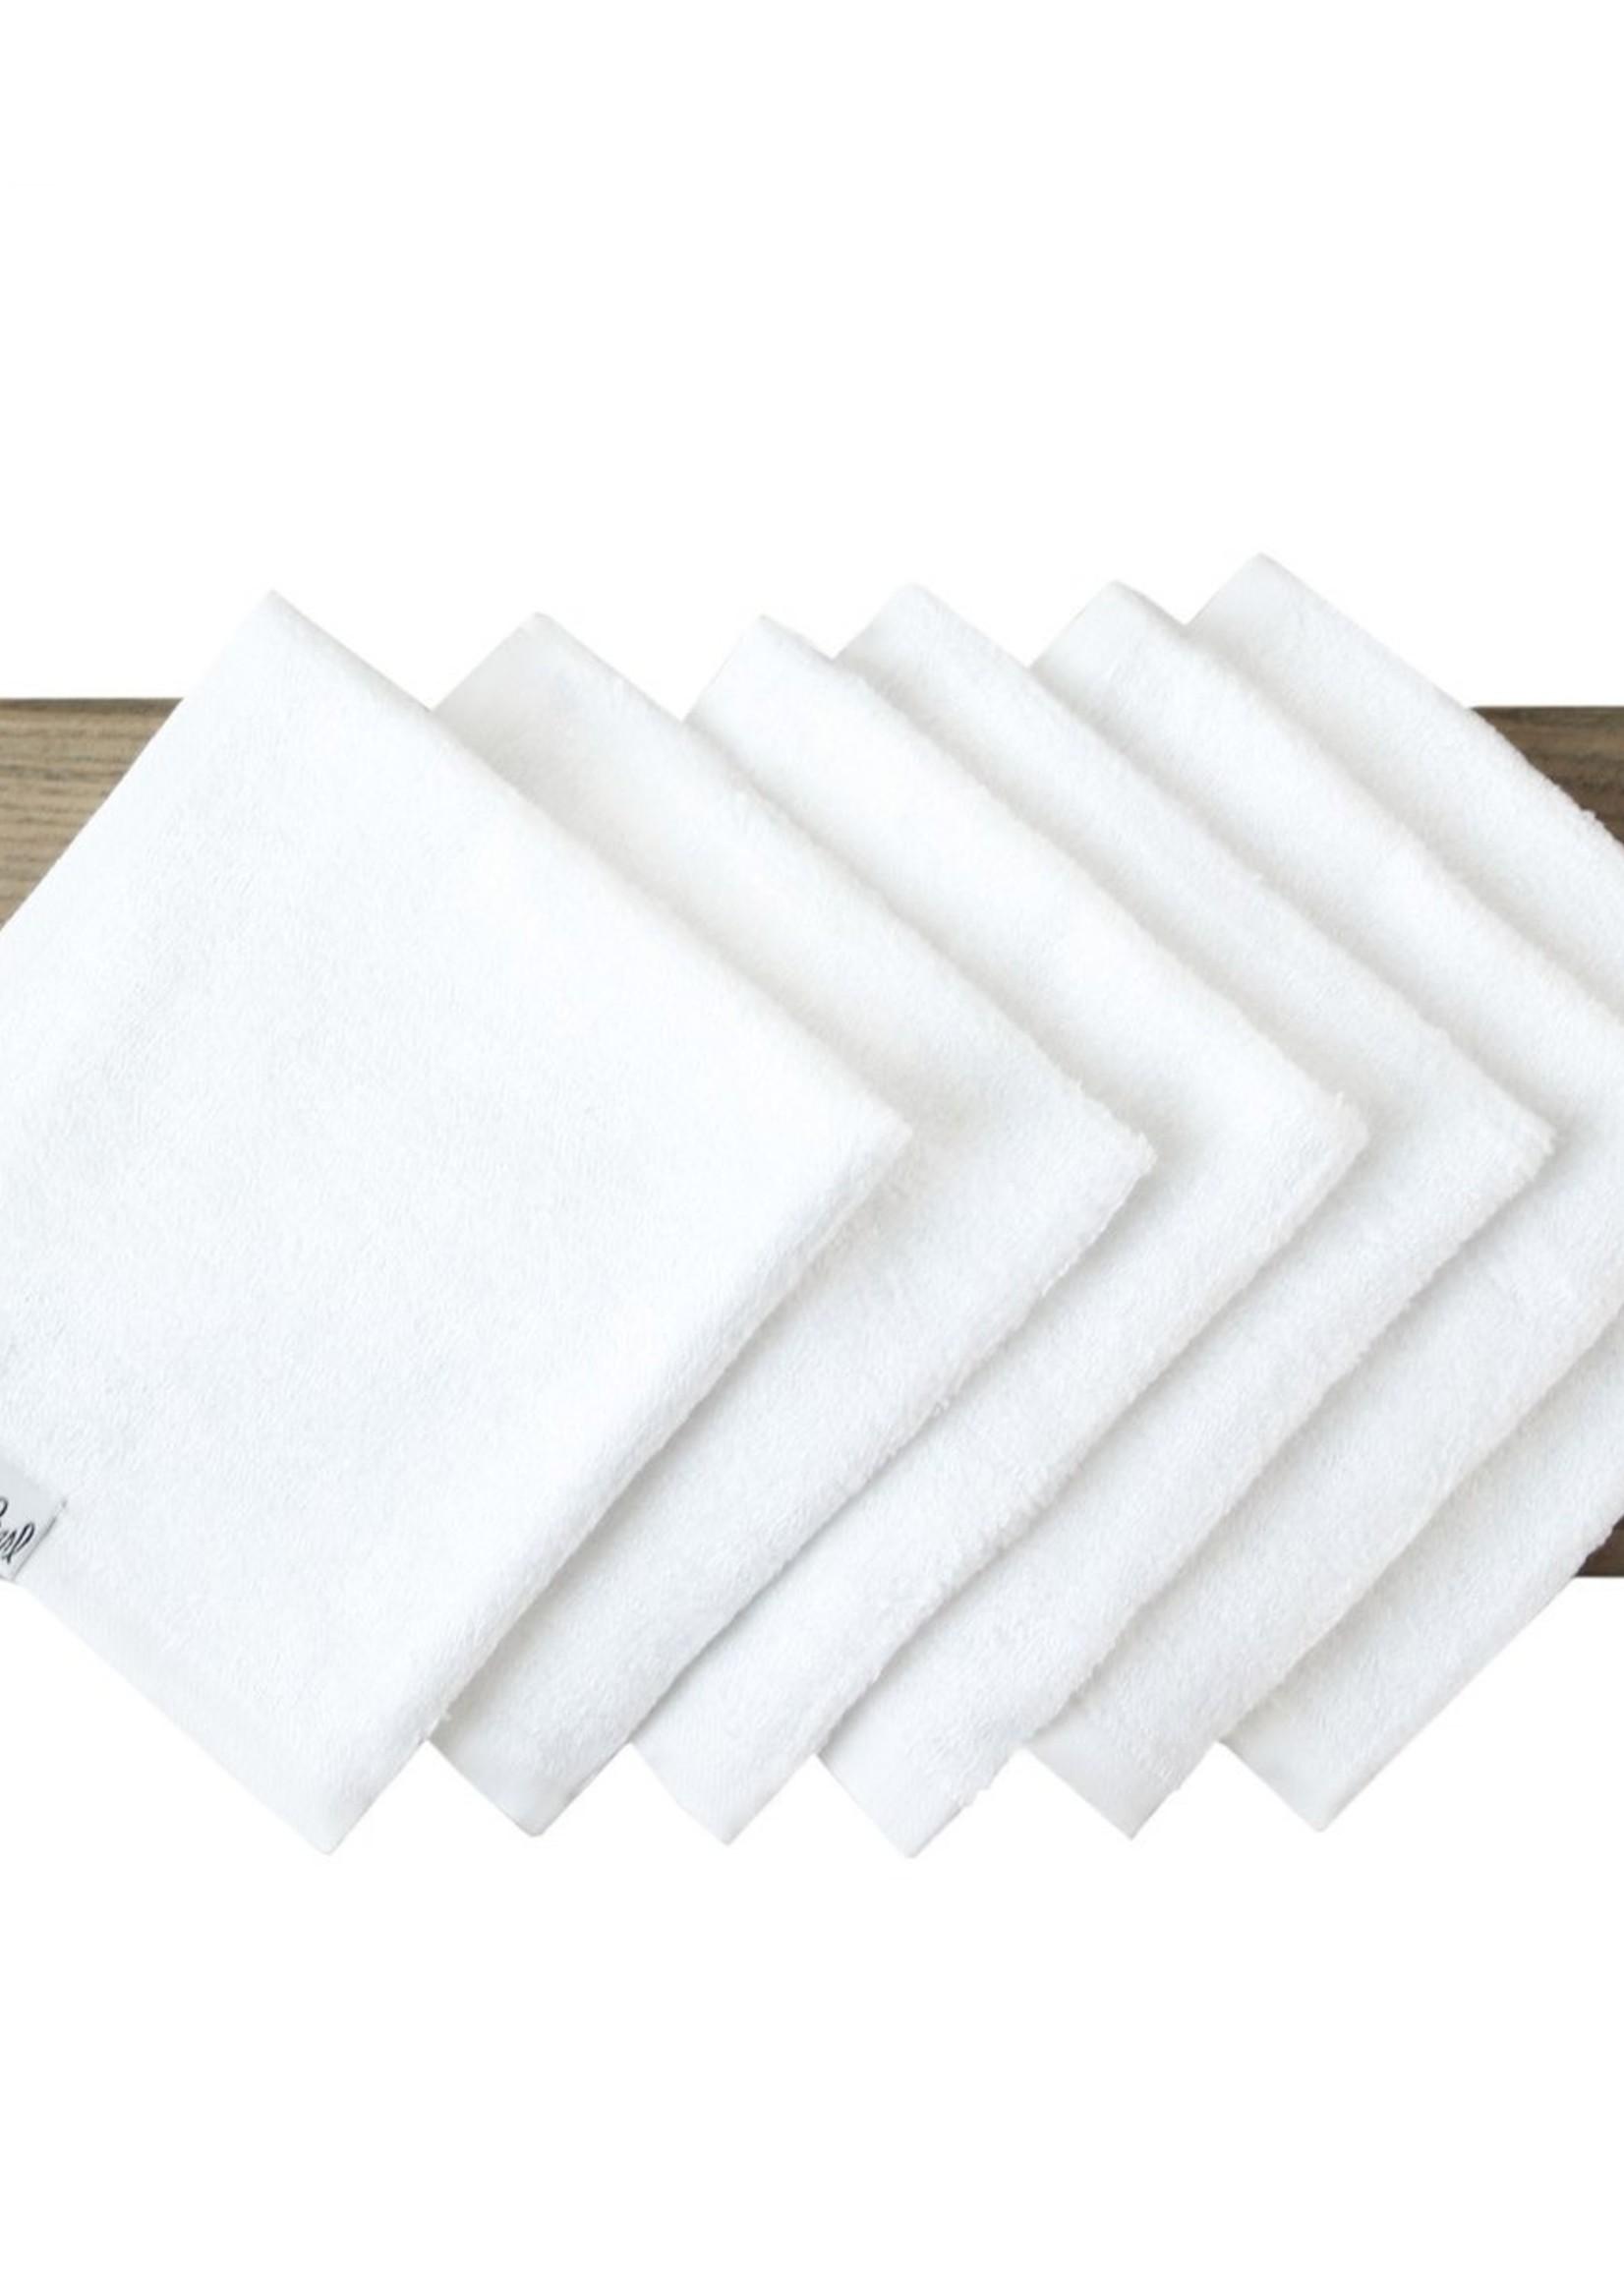 COPPER PEARL 6 Ultra Soft Washcloth Set WHITE